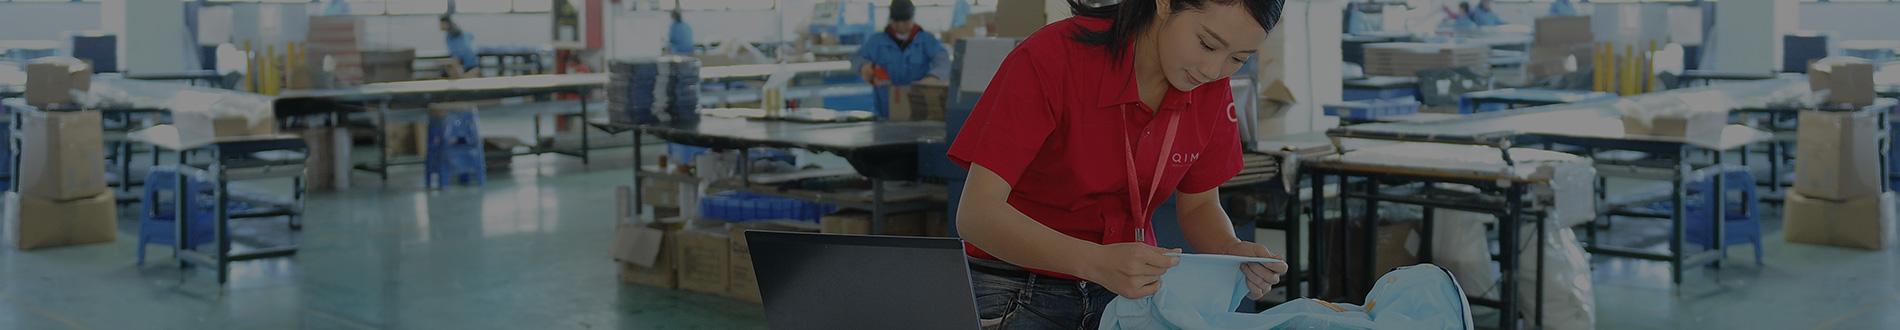 Garment & Apparel Quality Control Testing | QIMA